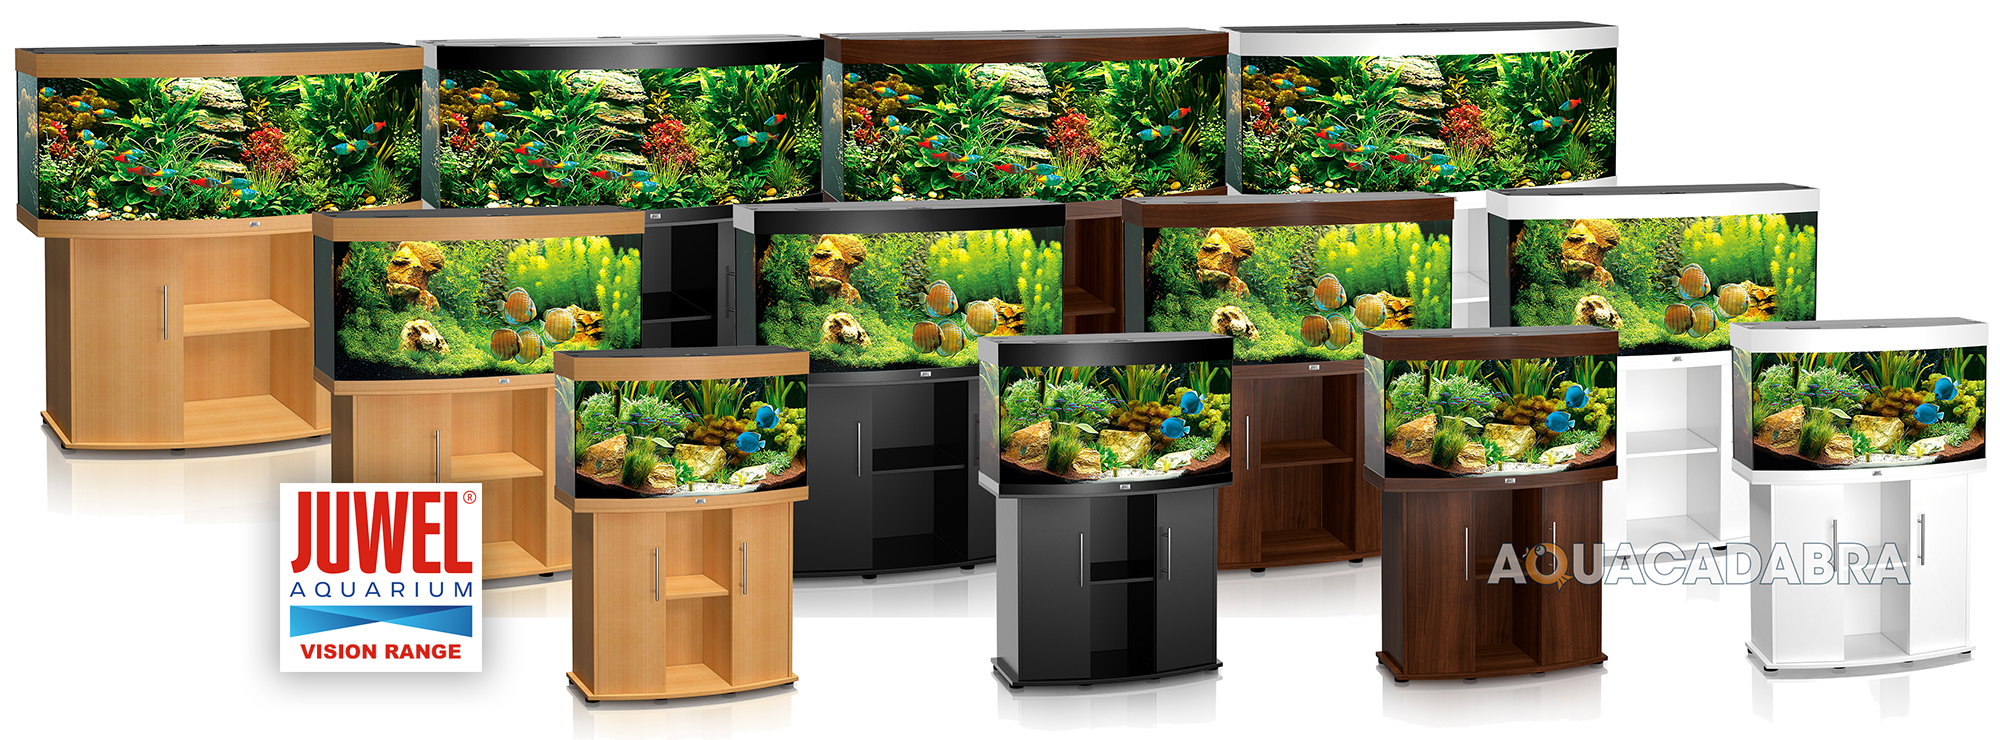 Juwel aquarium fish tank - Juwel Aquarium Fish Tank Cabinet Rio Trigon Vision